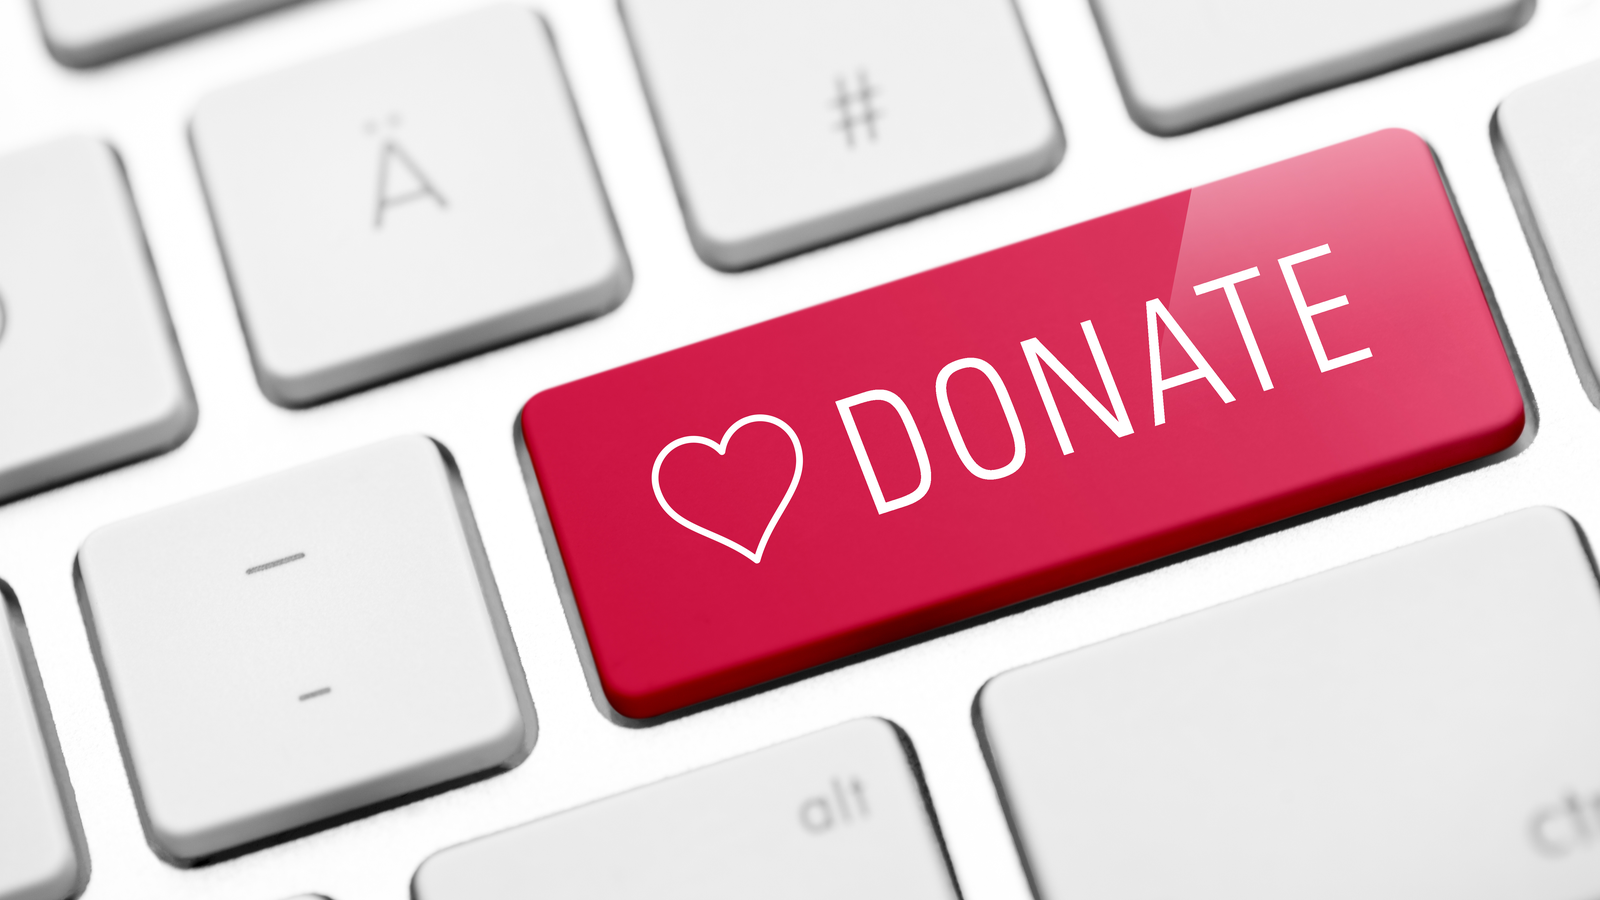 online donate key on computer keyboard